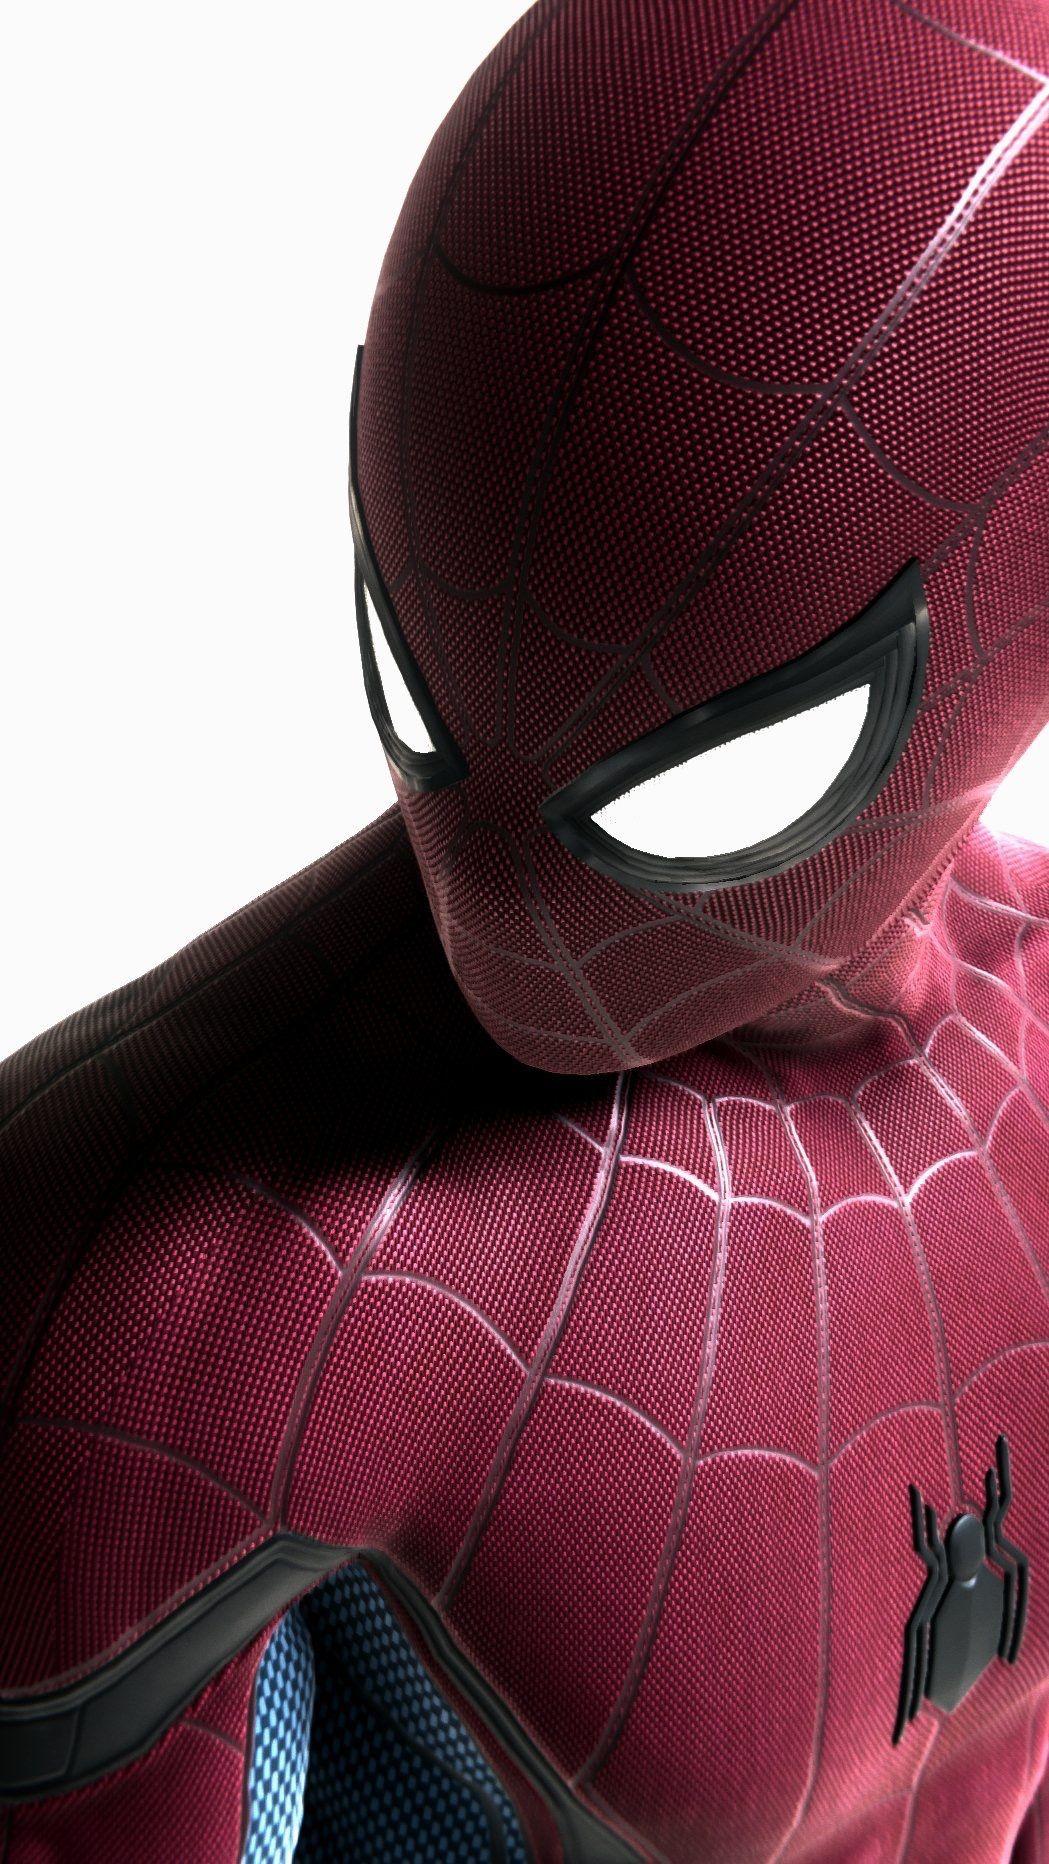 Pin By Arkhamnatic Arts On Marvel Comics Pinterest Spiderman Marvel And Marvel Comics